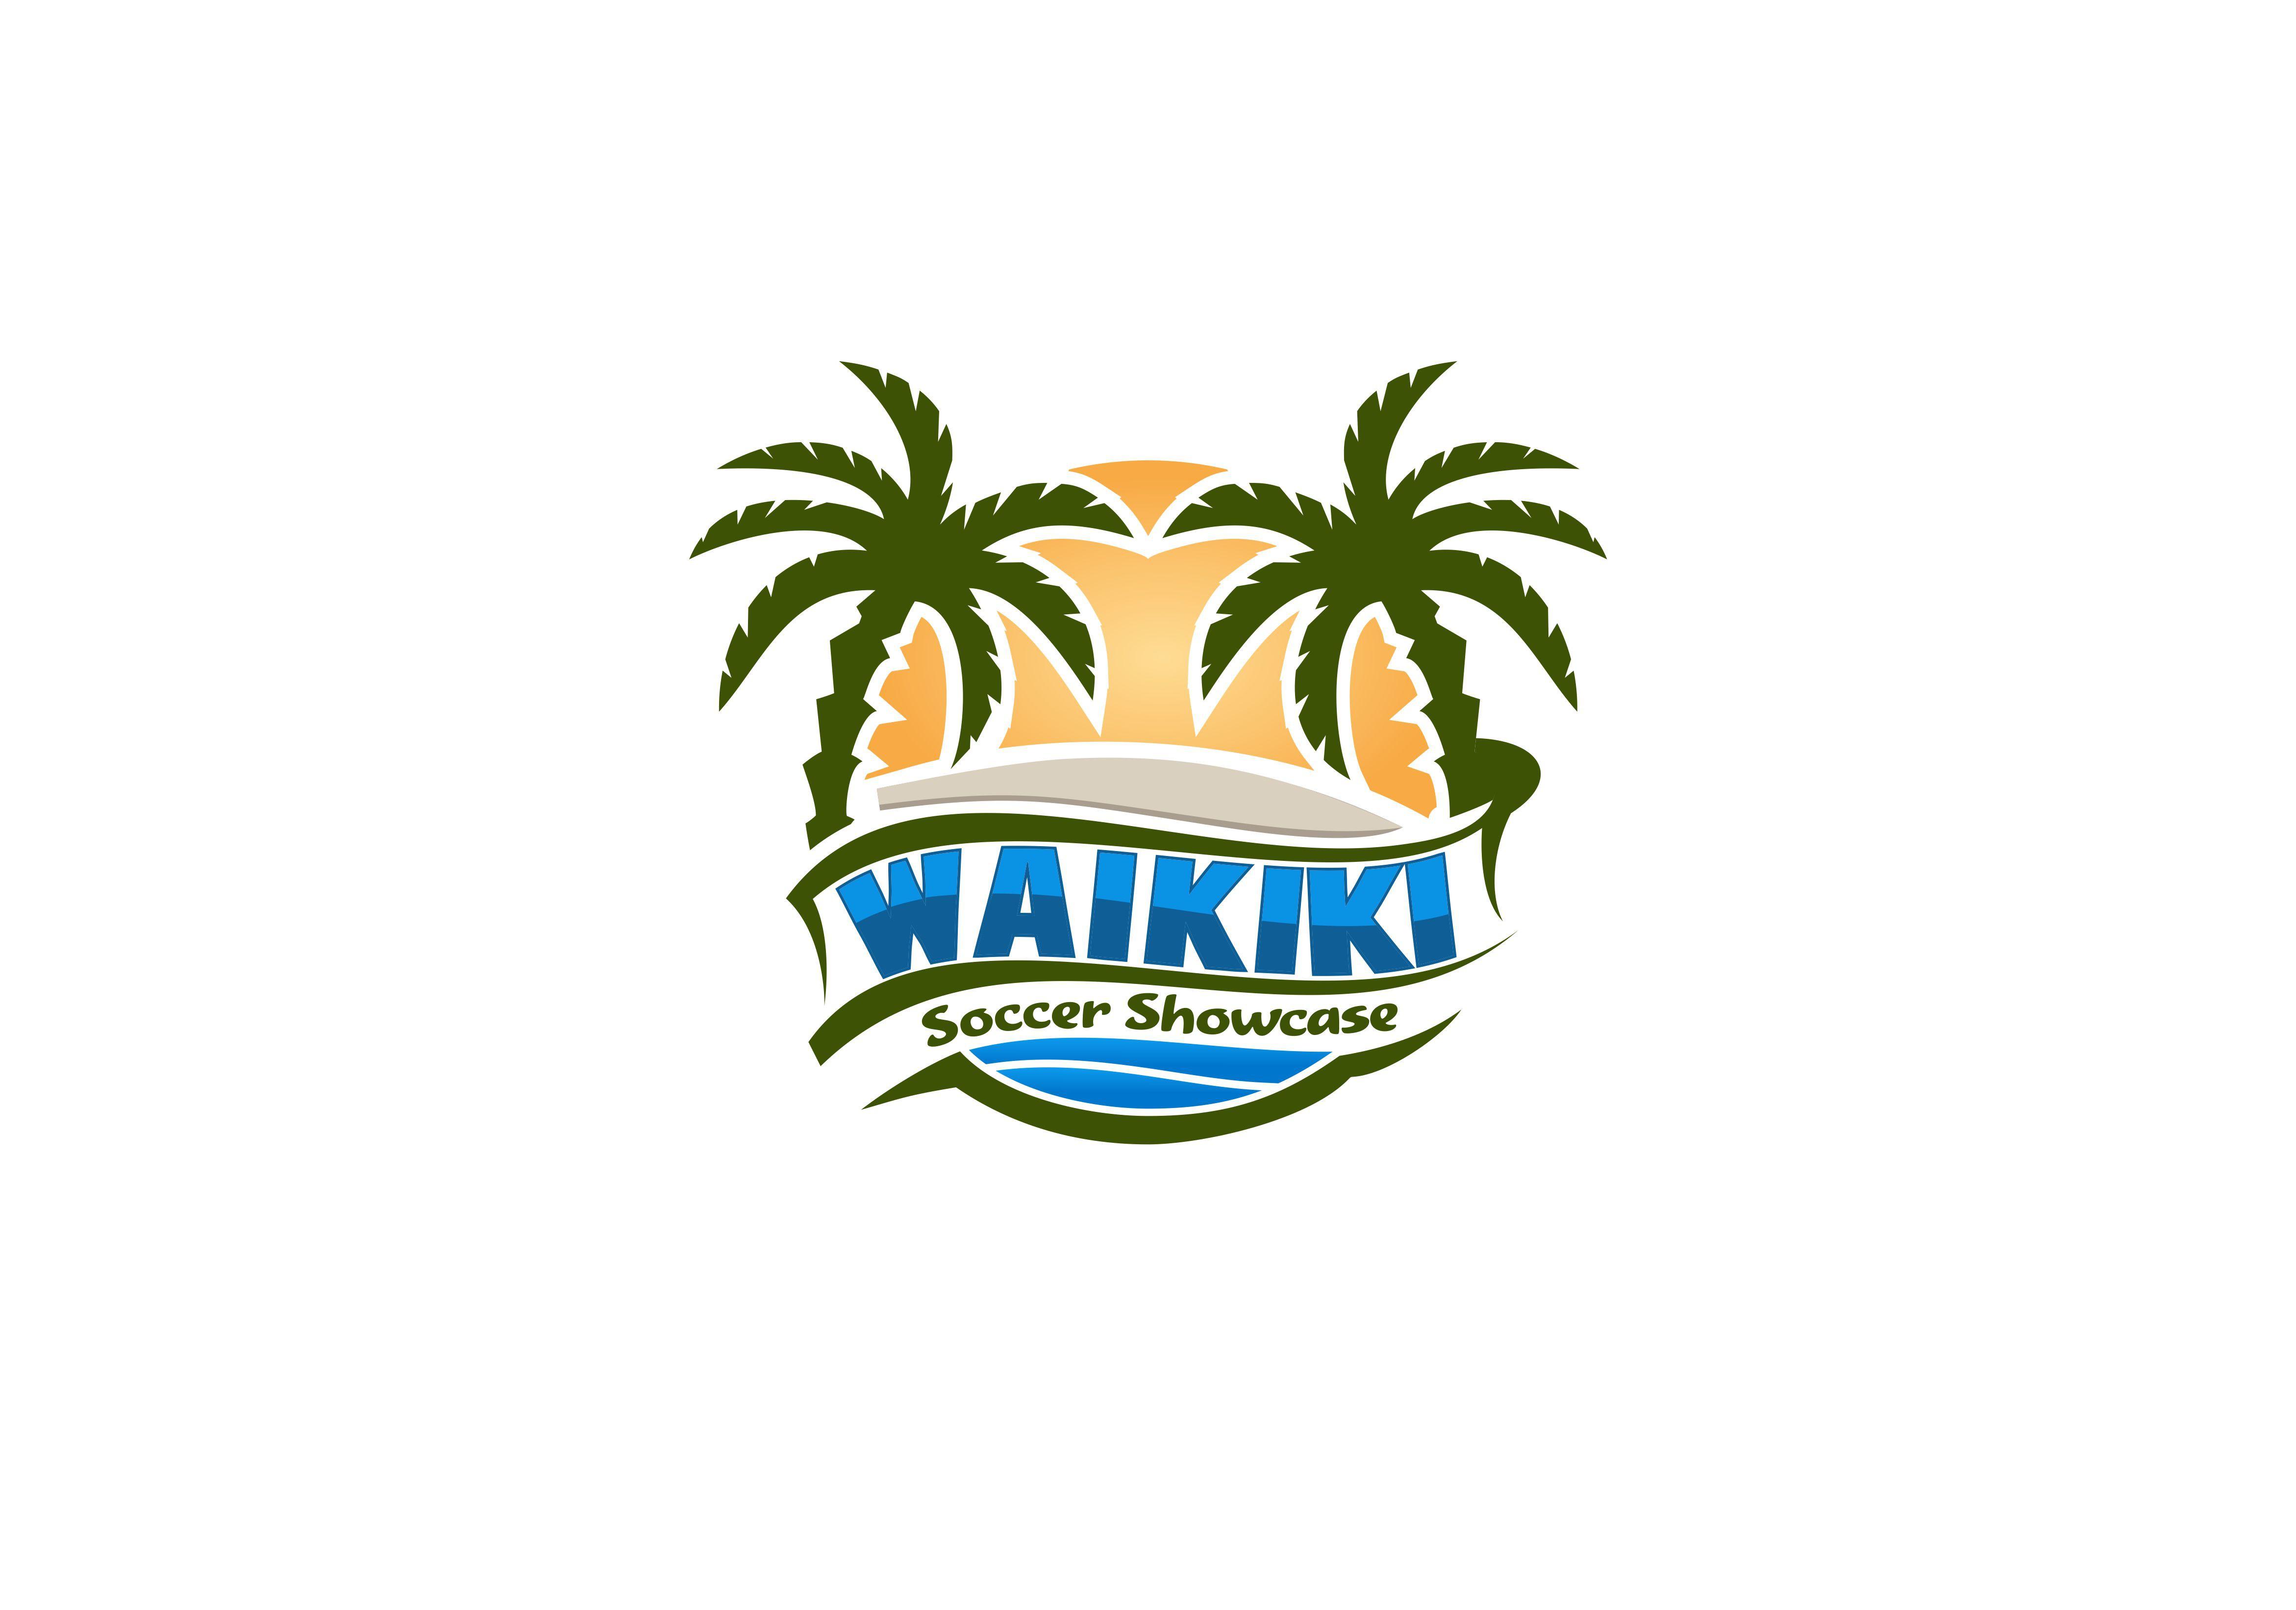 Waikiki Beach Showcase needs a cool sports/beach logo